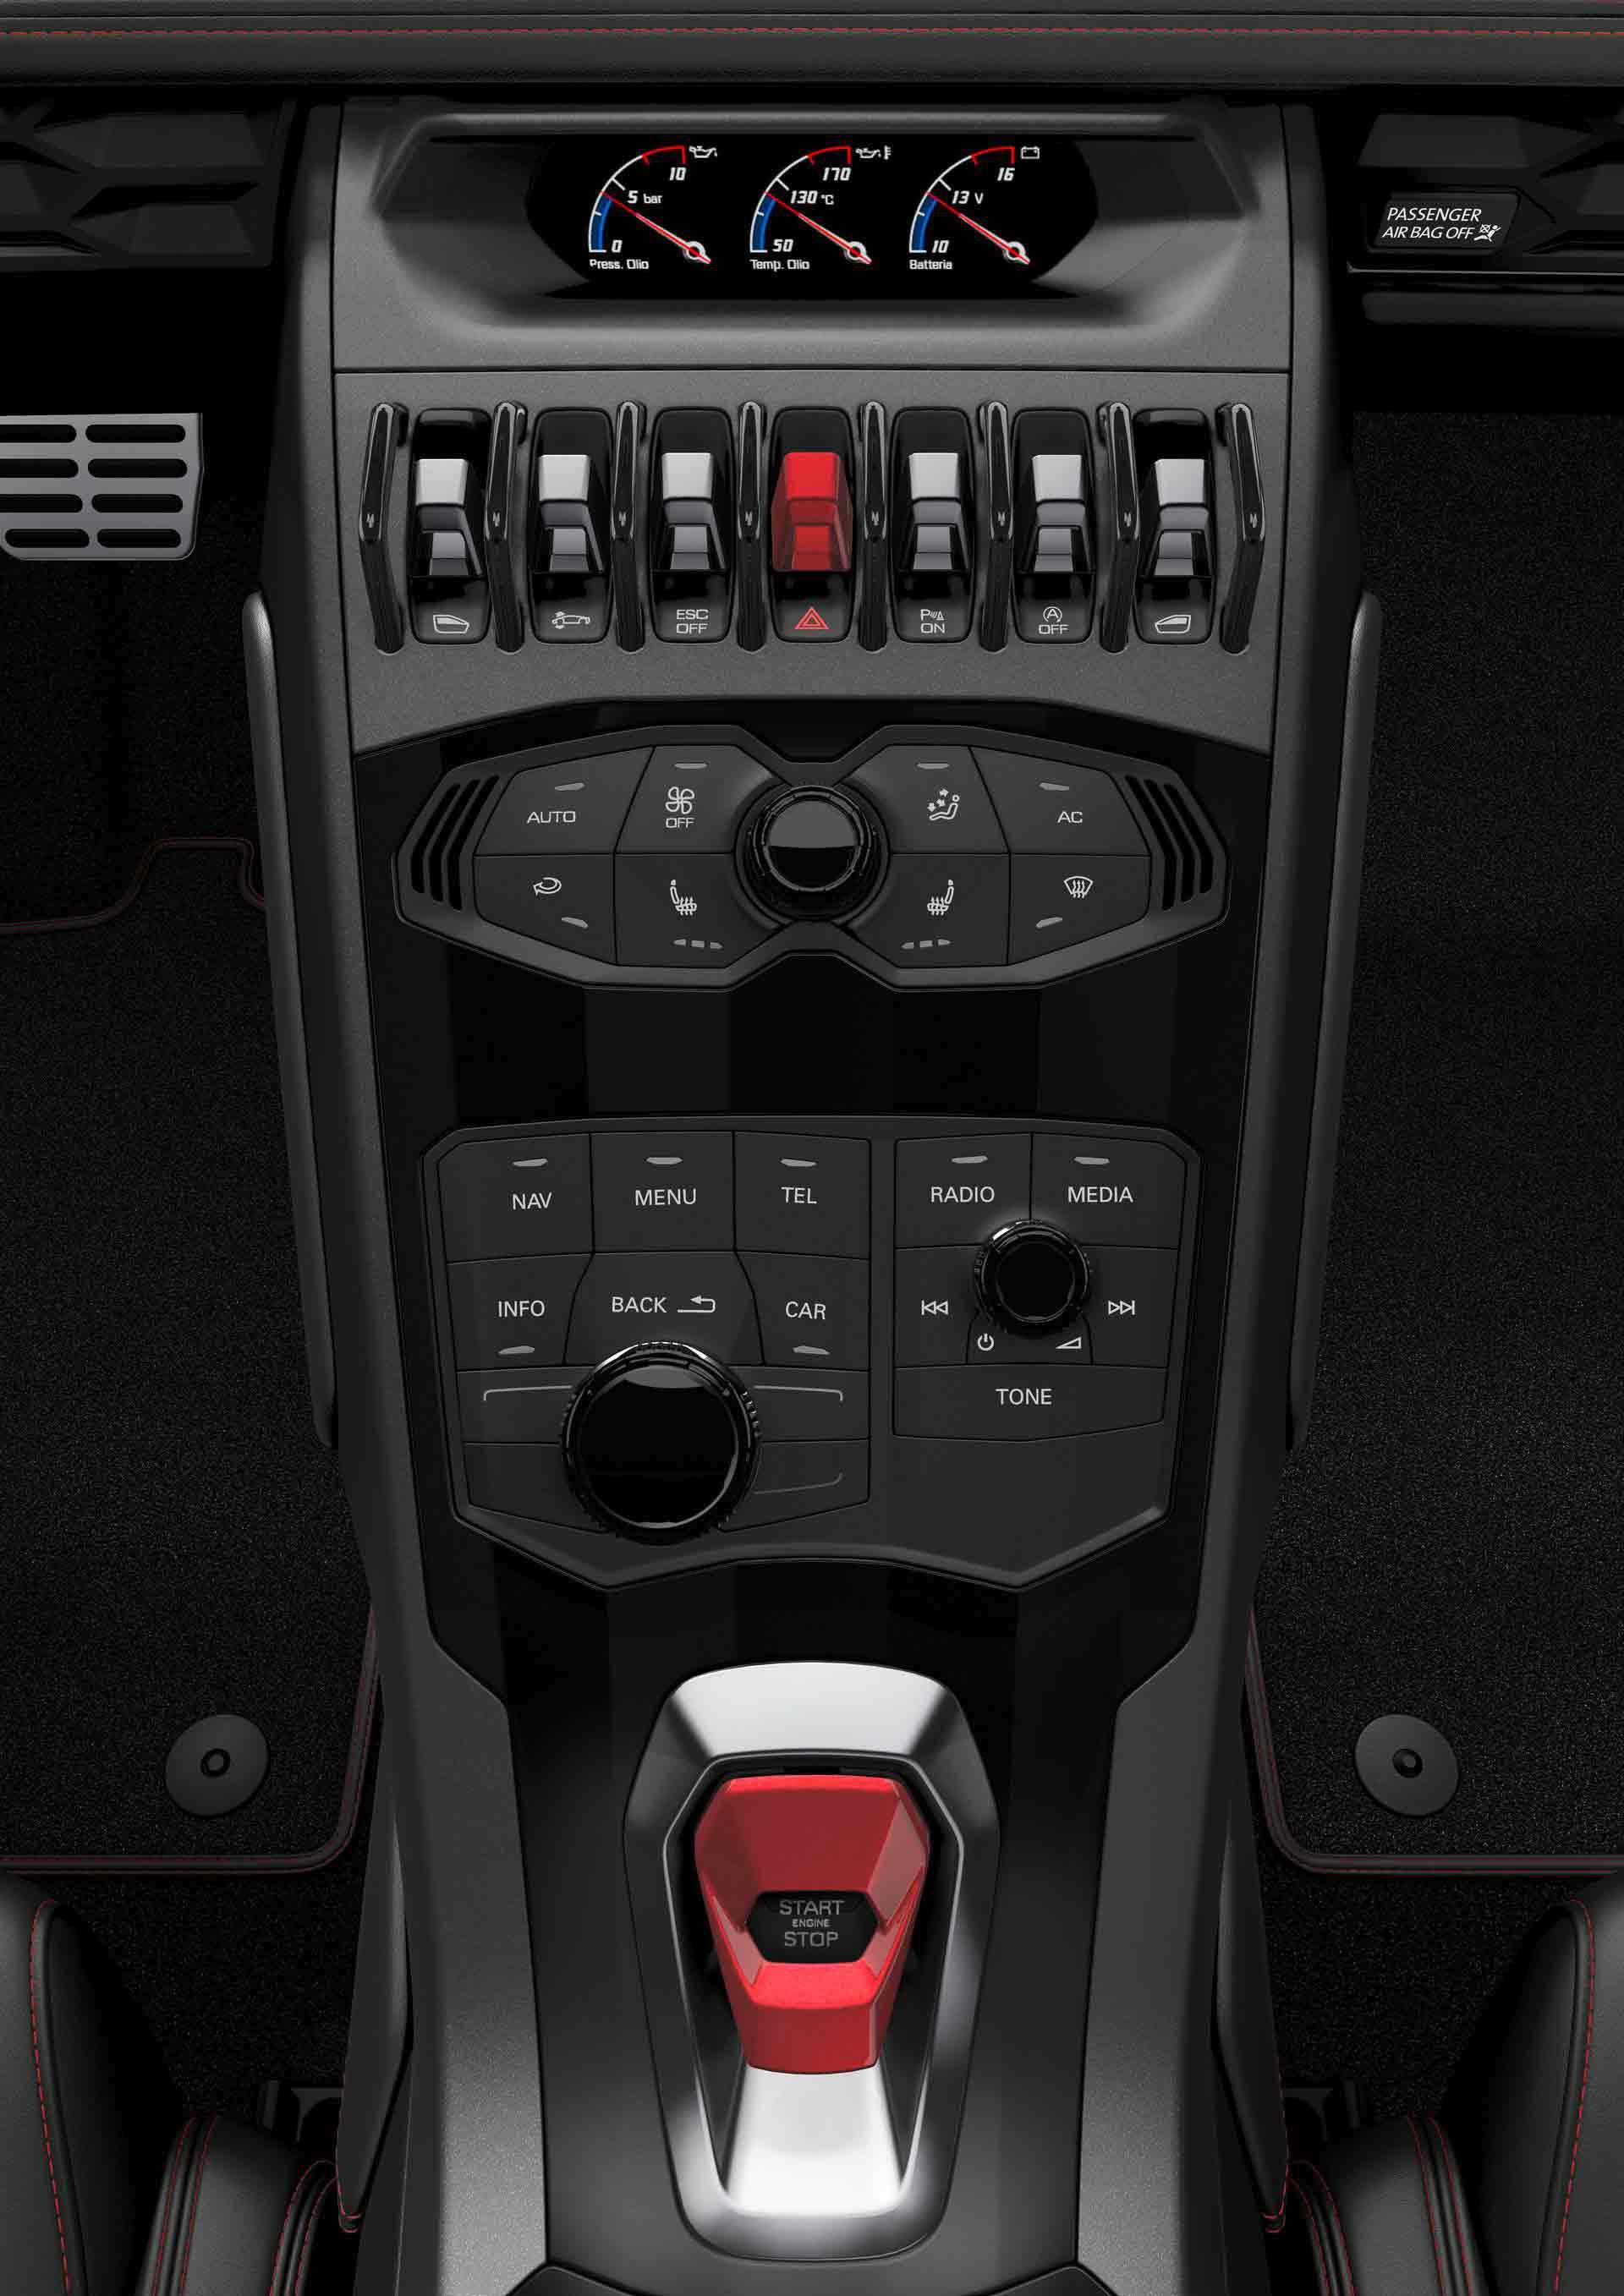 _Lamborghini-Huracan-mittelkonsole